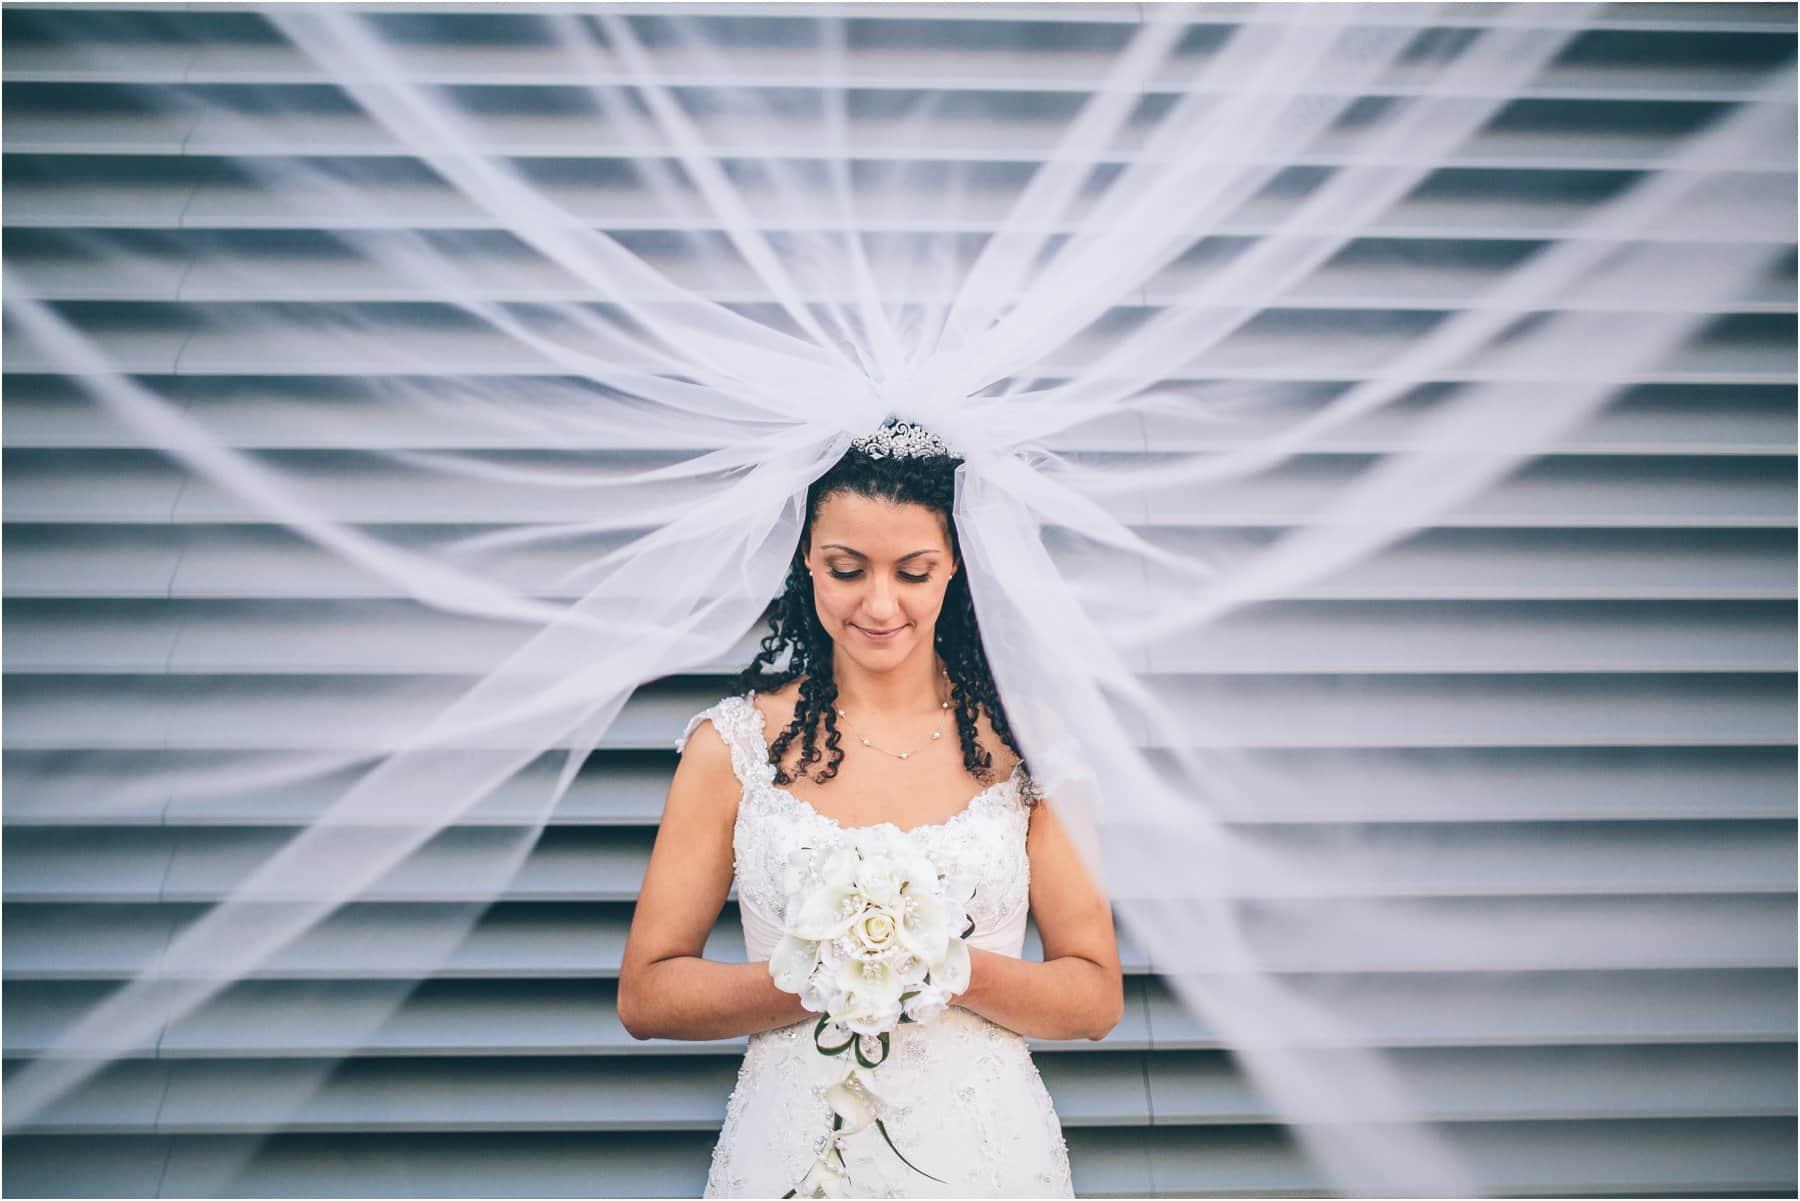 Midland_Manchester_Wedding_Photography_0090